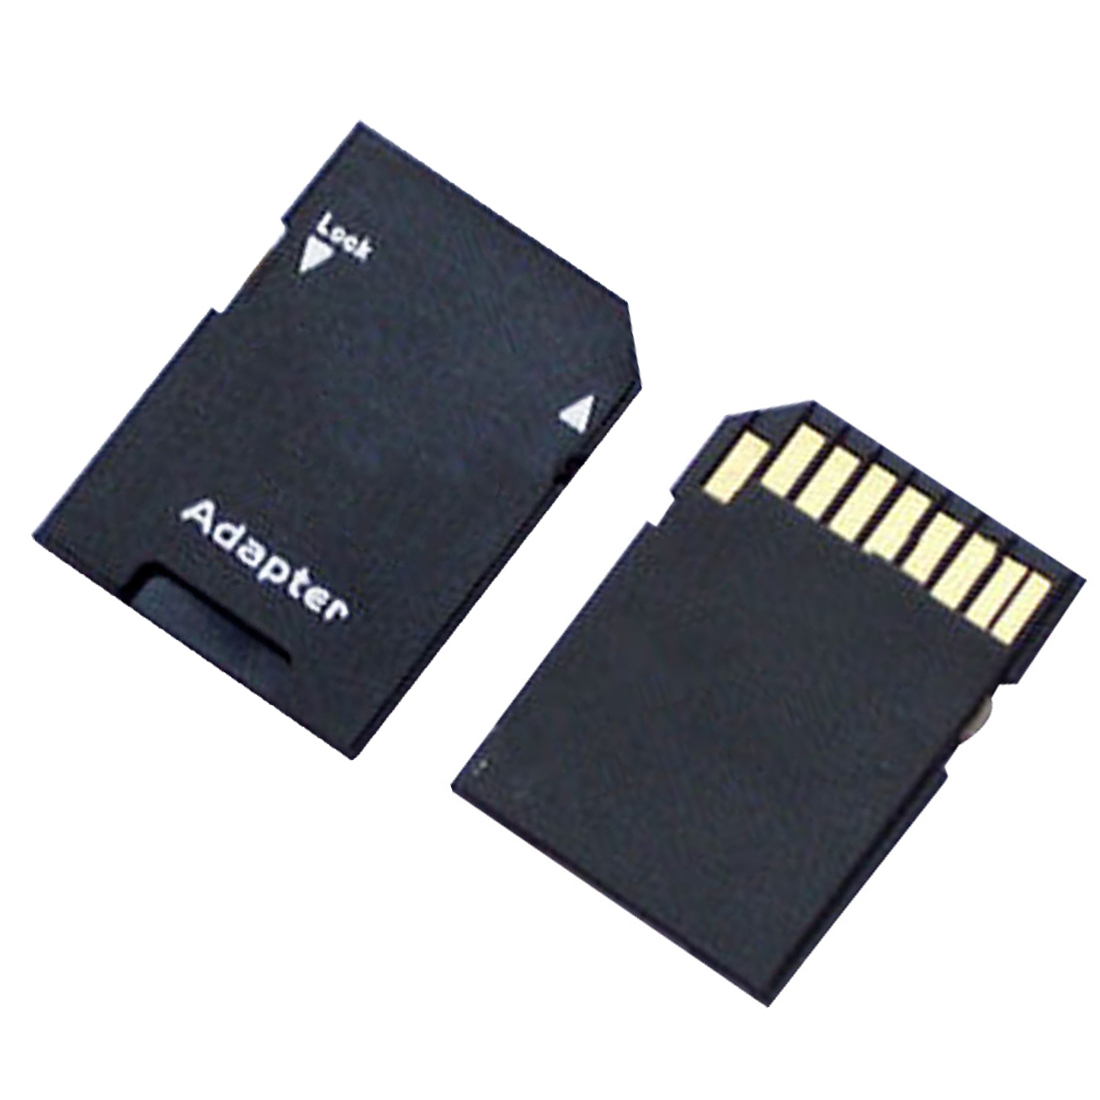 NOYOKERE 2PCS Hot Sale Popular Micro SD TransFlash TF To SD SDHC Memory Card Adapter Convert Into SD Card